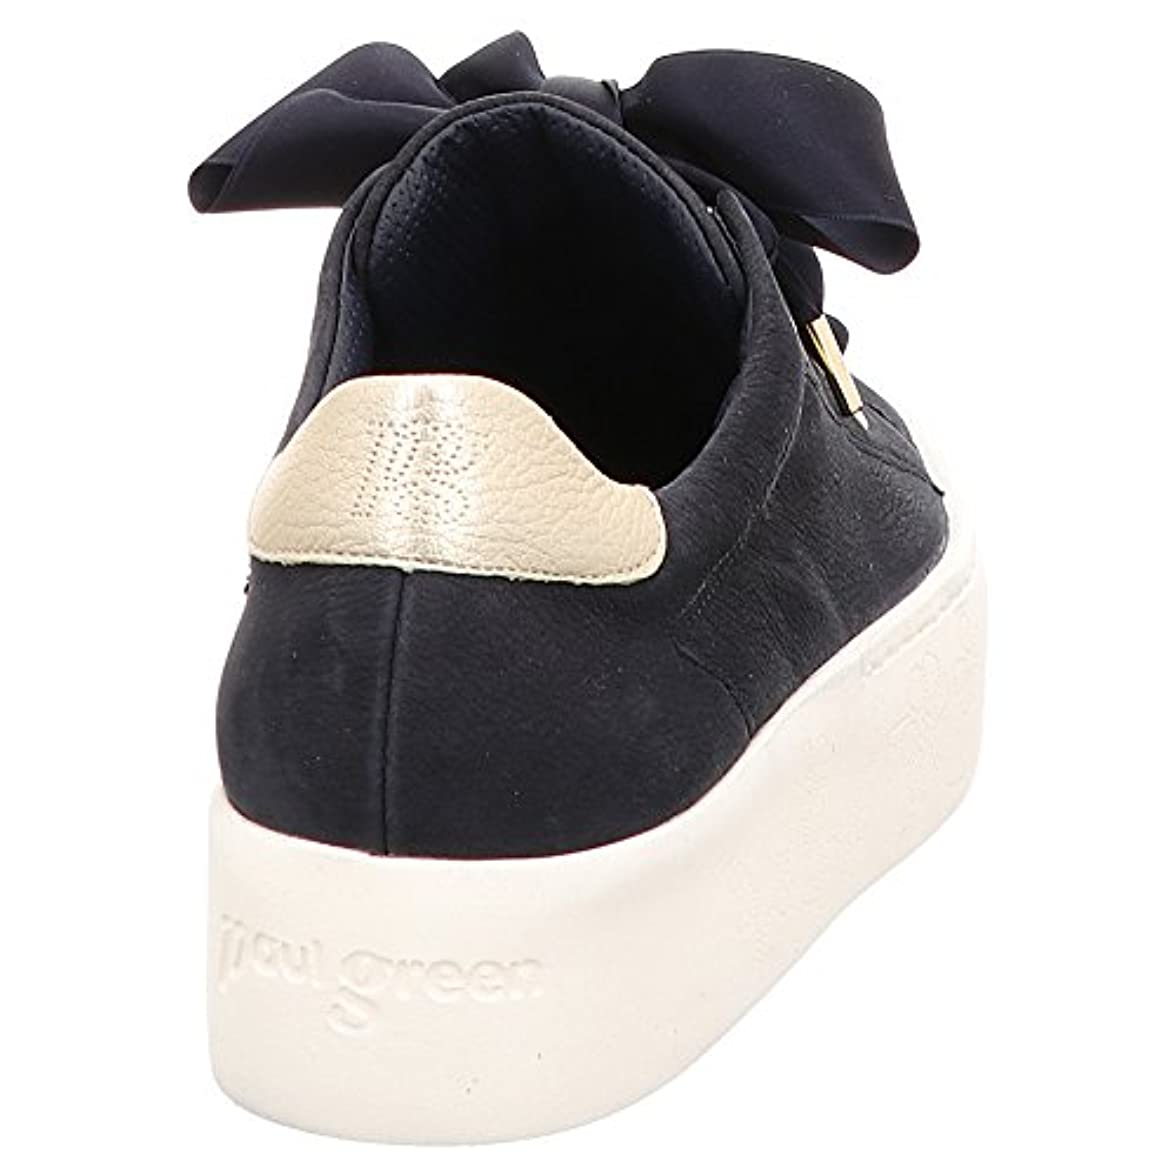 Paul Green 4621-042 Sneaker Donna